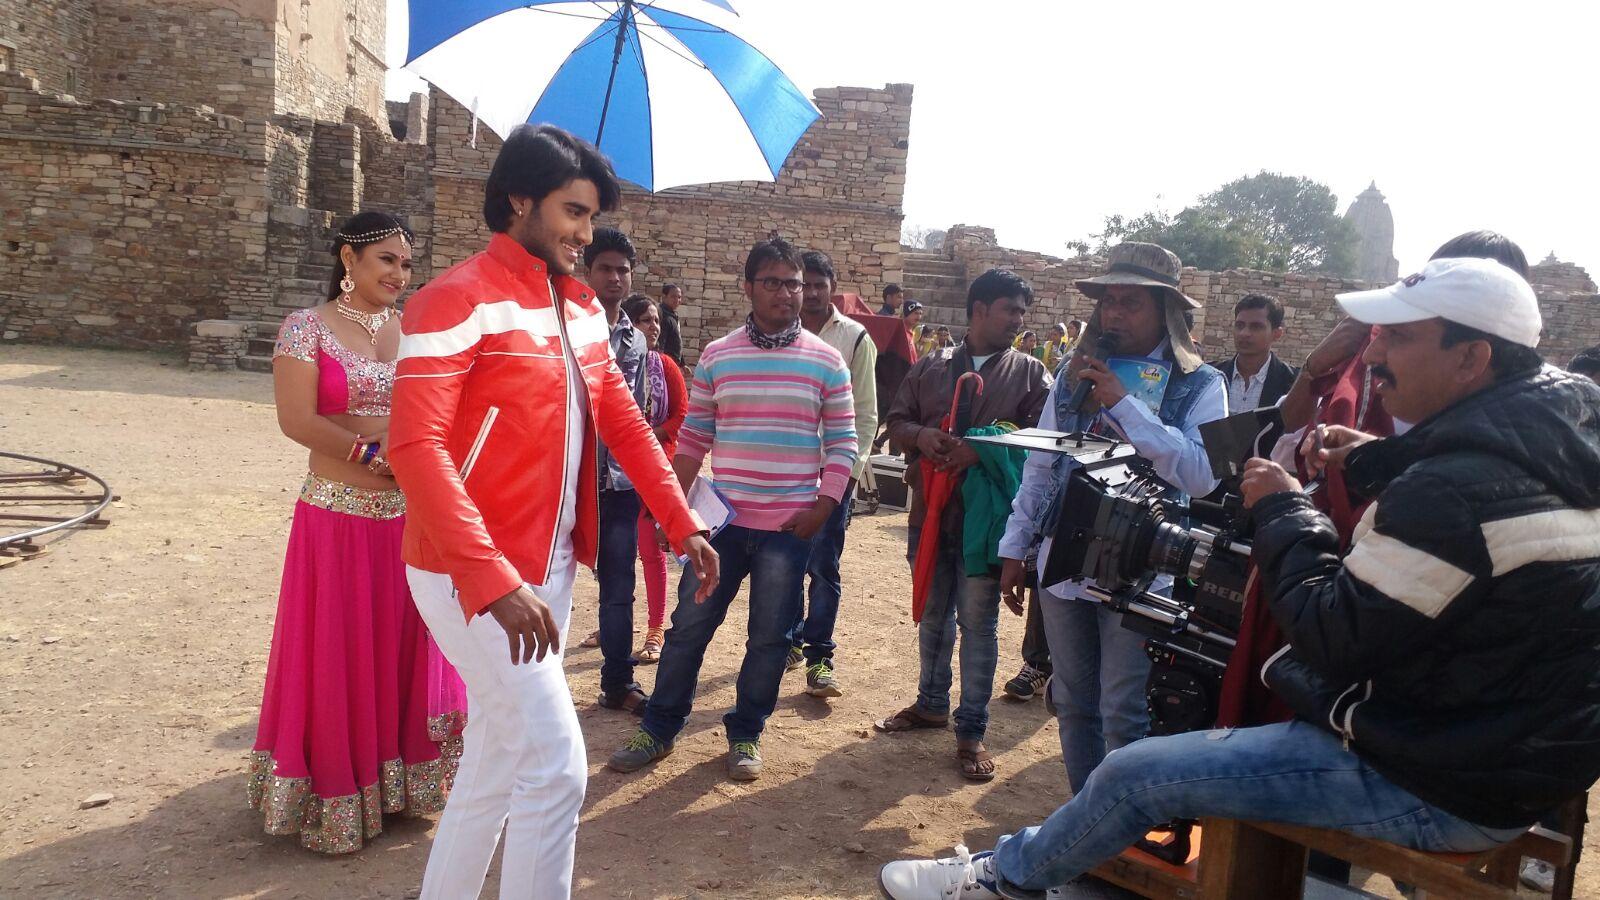 Priyanka Pandit Stills in film photo